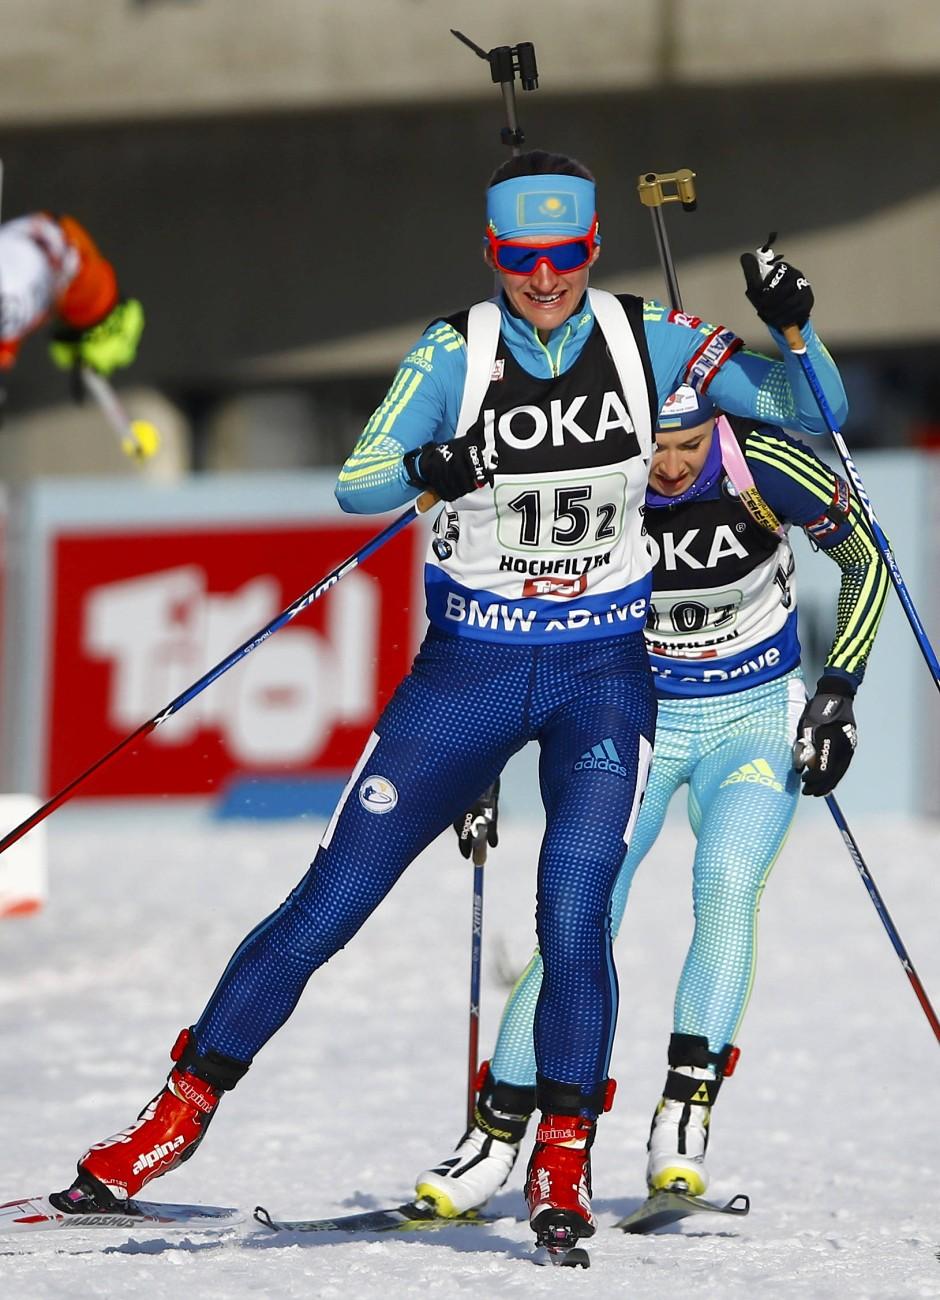 Mixed Staffel Biathlon Heute